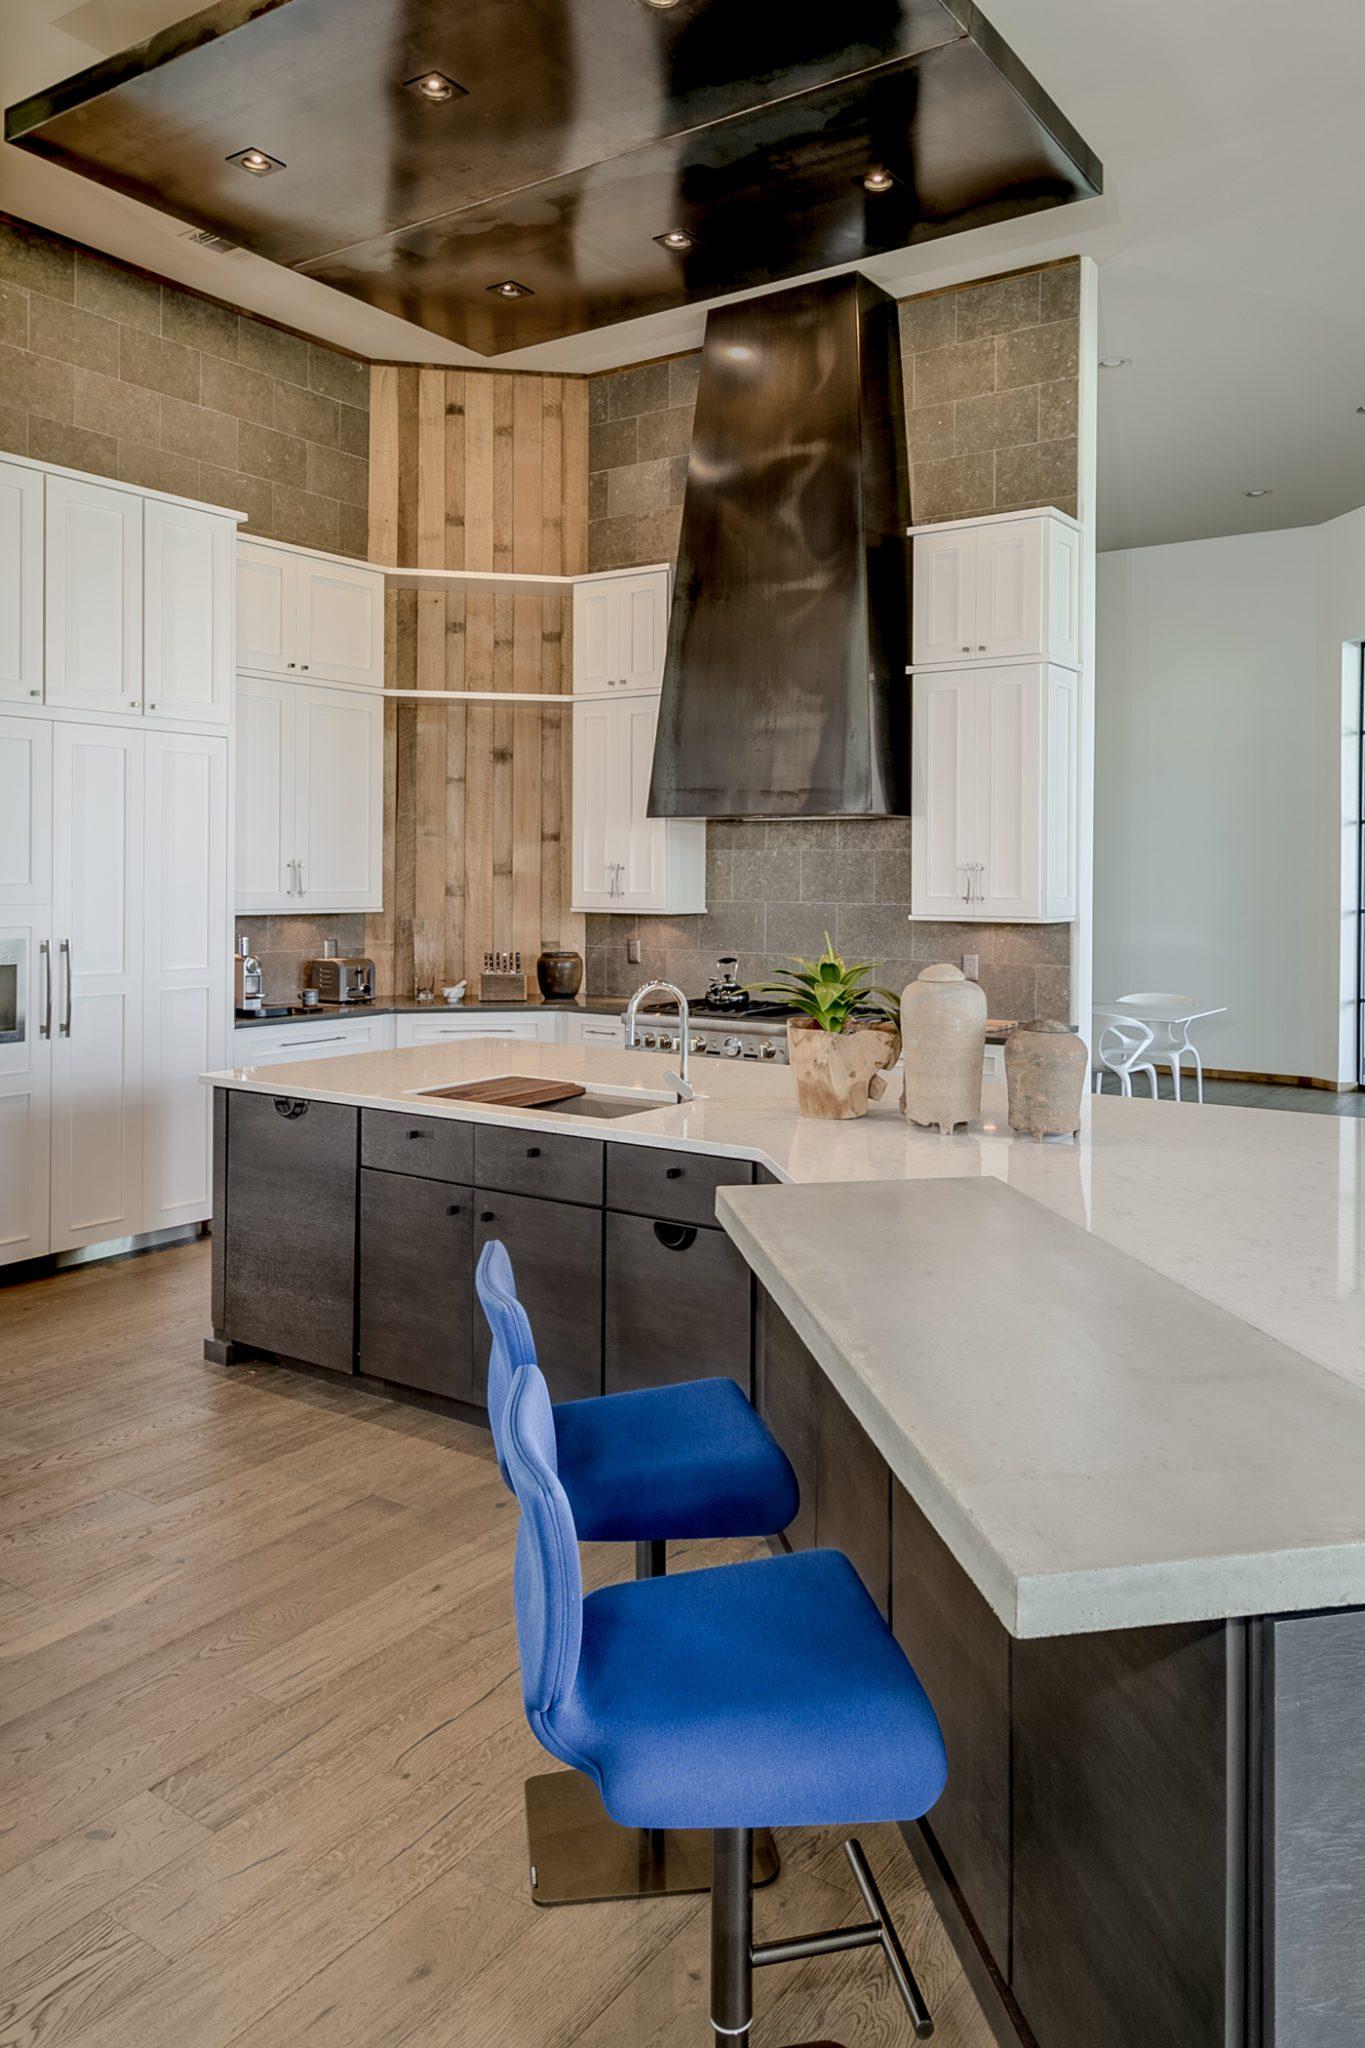 kitchens etc kitchen design on 30a 36 Kitchens Etc 30A